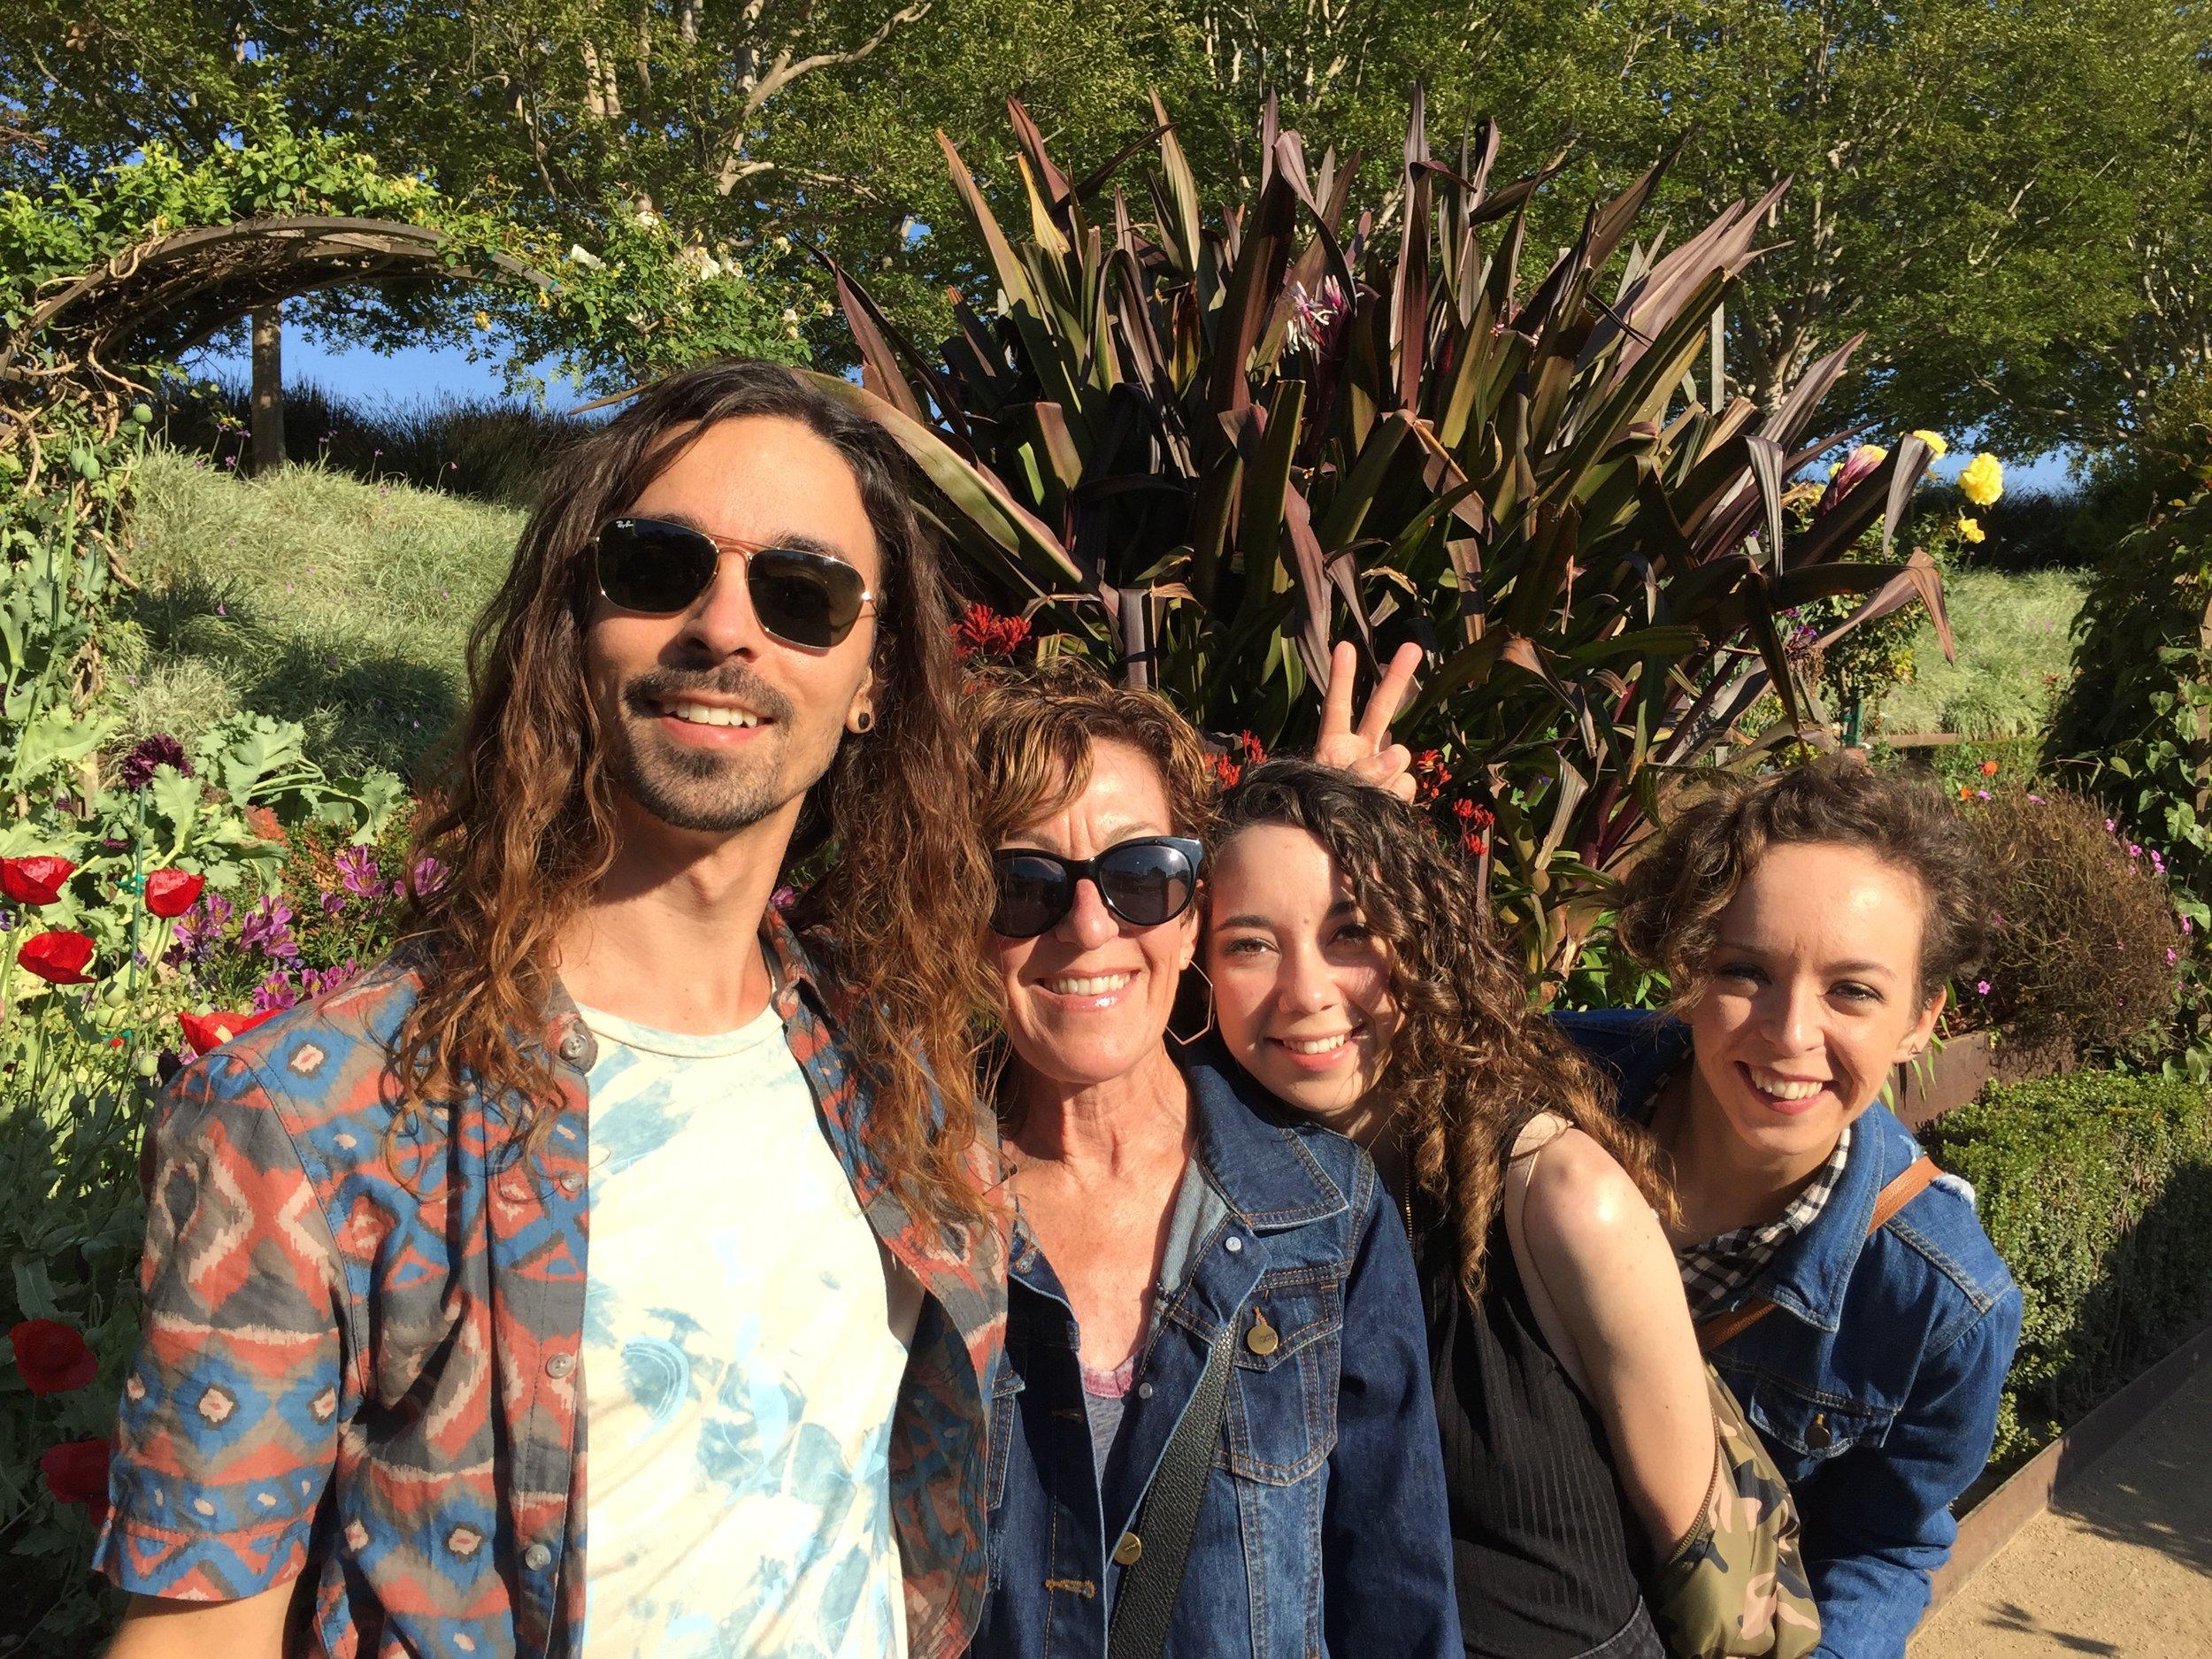 Kia snapped a photo of Jason, my mom, Claire and I soaking up the garden.